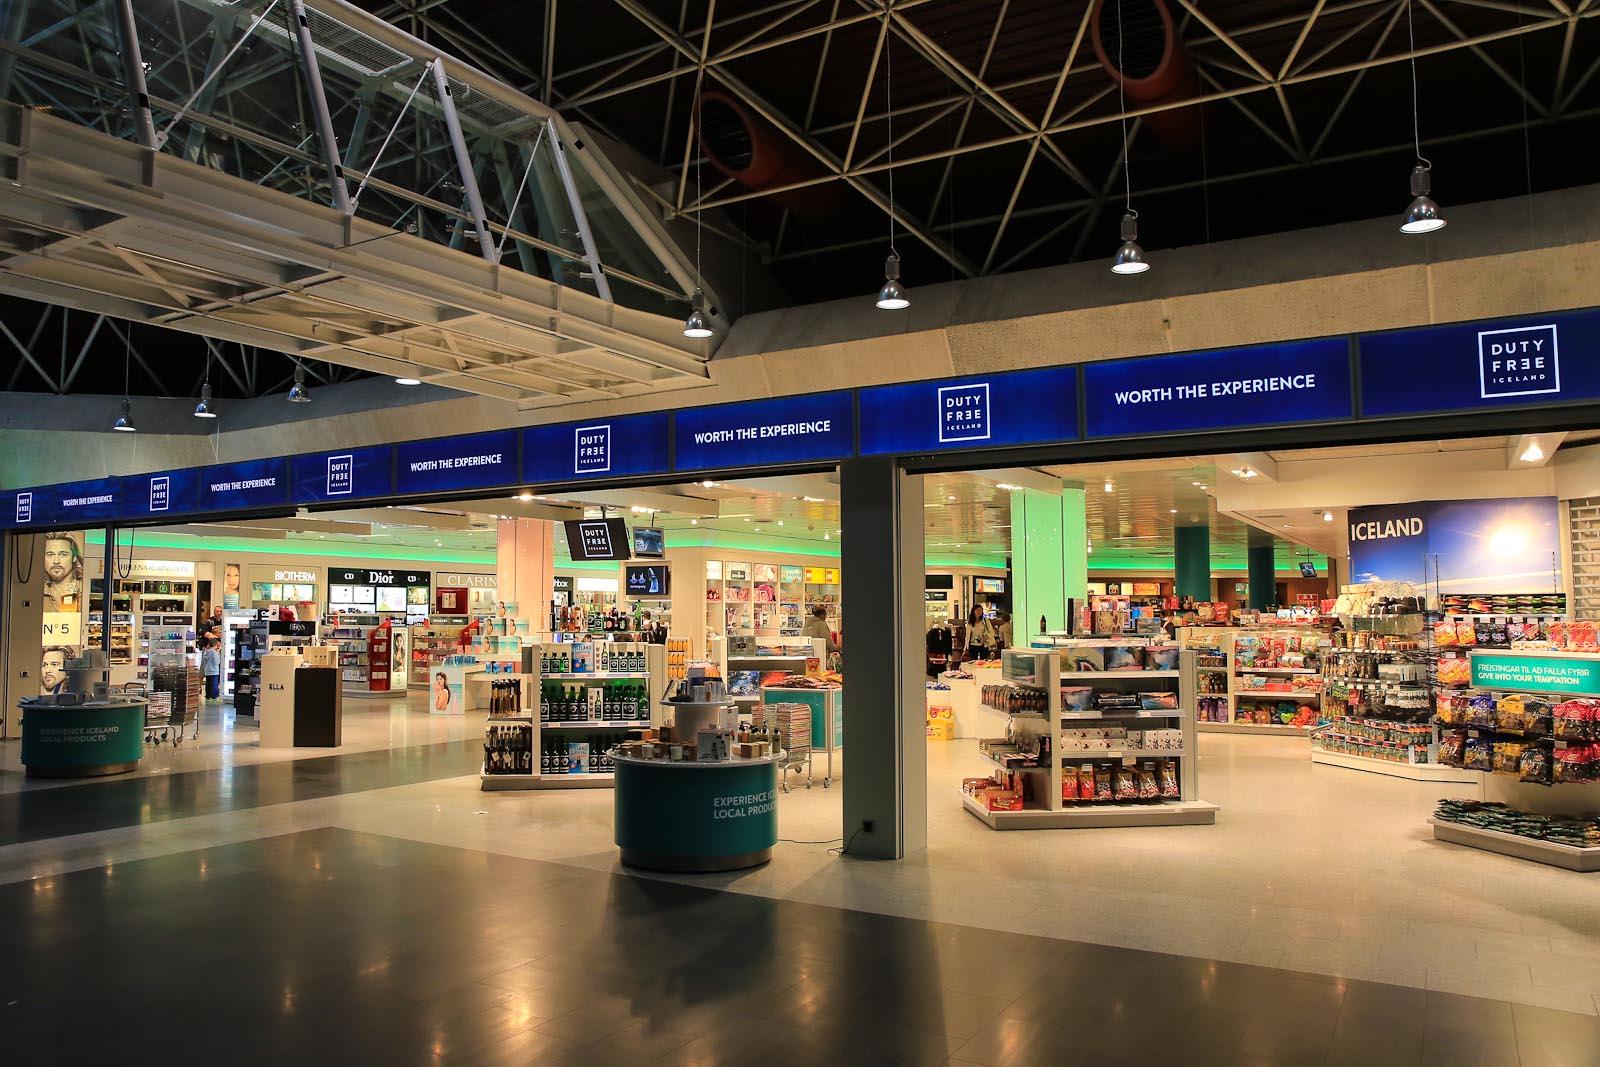 Магазин Duty-Free в аэропорту Кефлавик